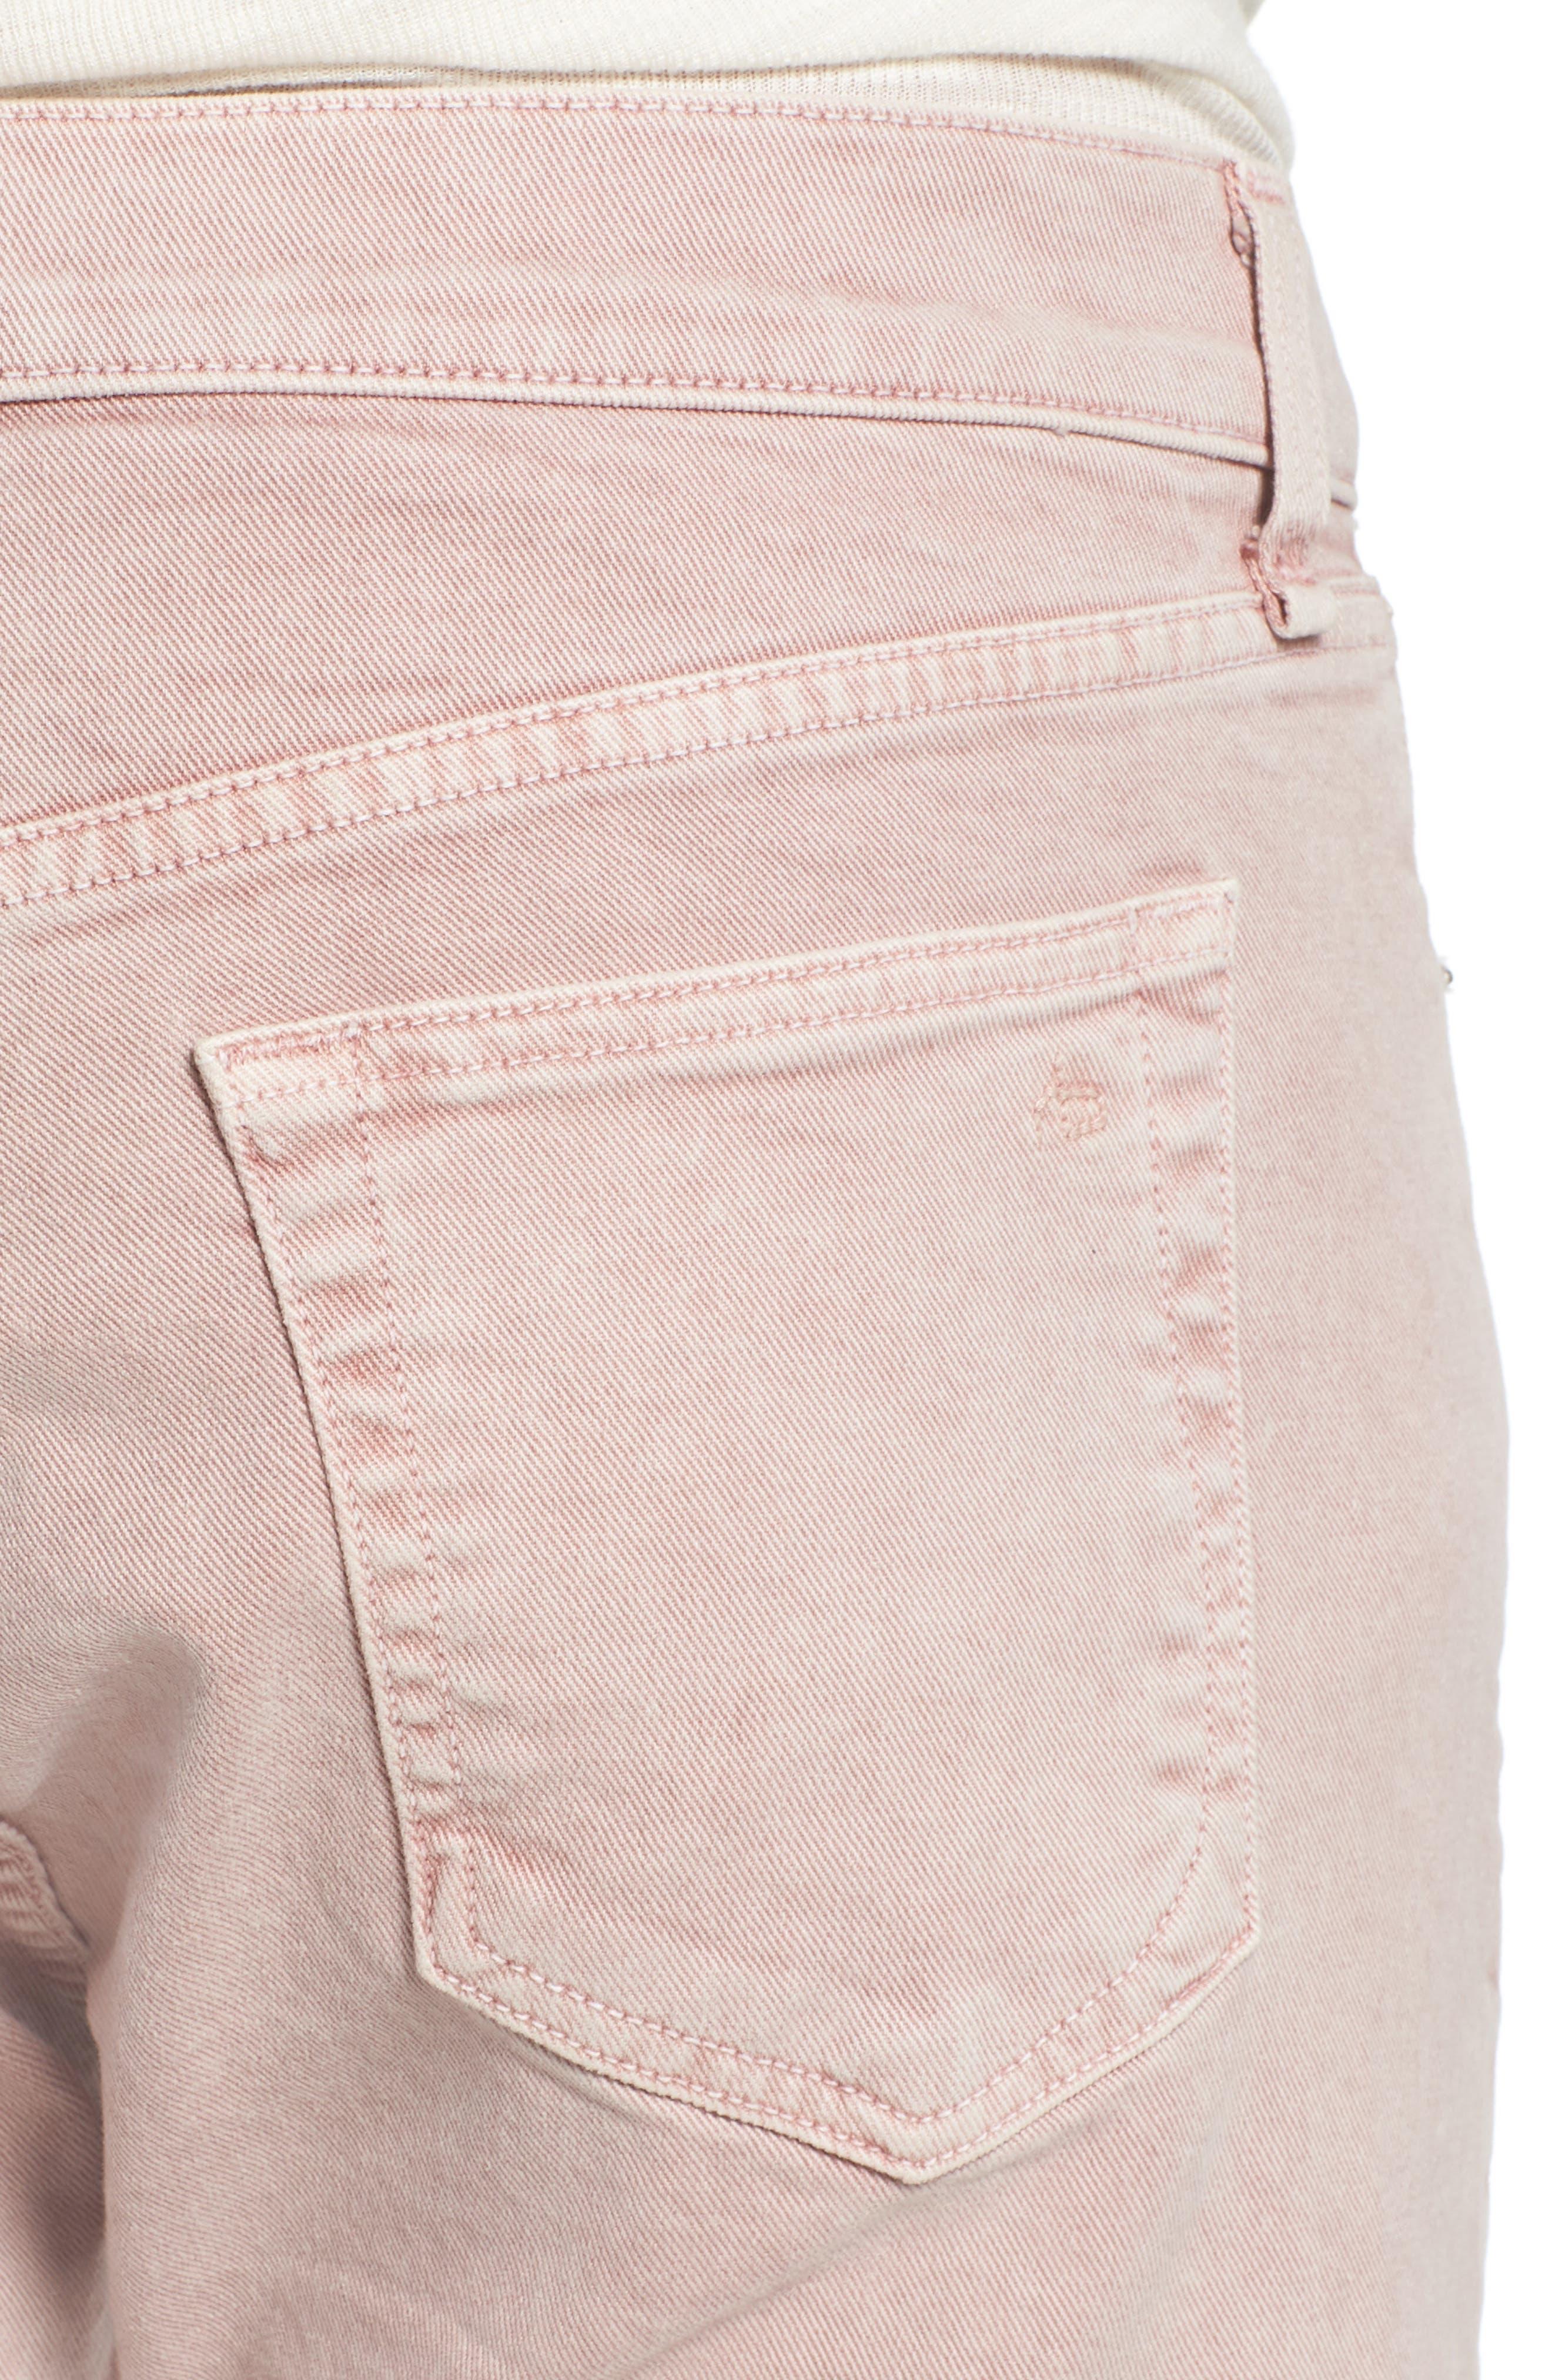 Fit 2 Slim Fit Jeans,                             Alternate thumbnail 4, color,                             BUD